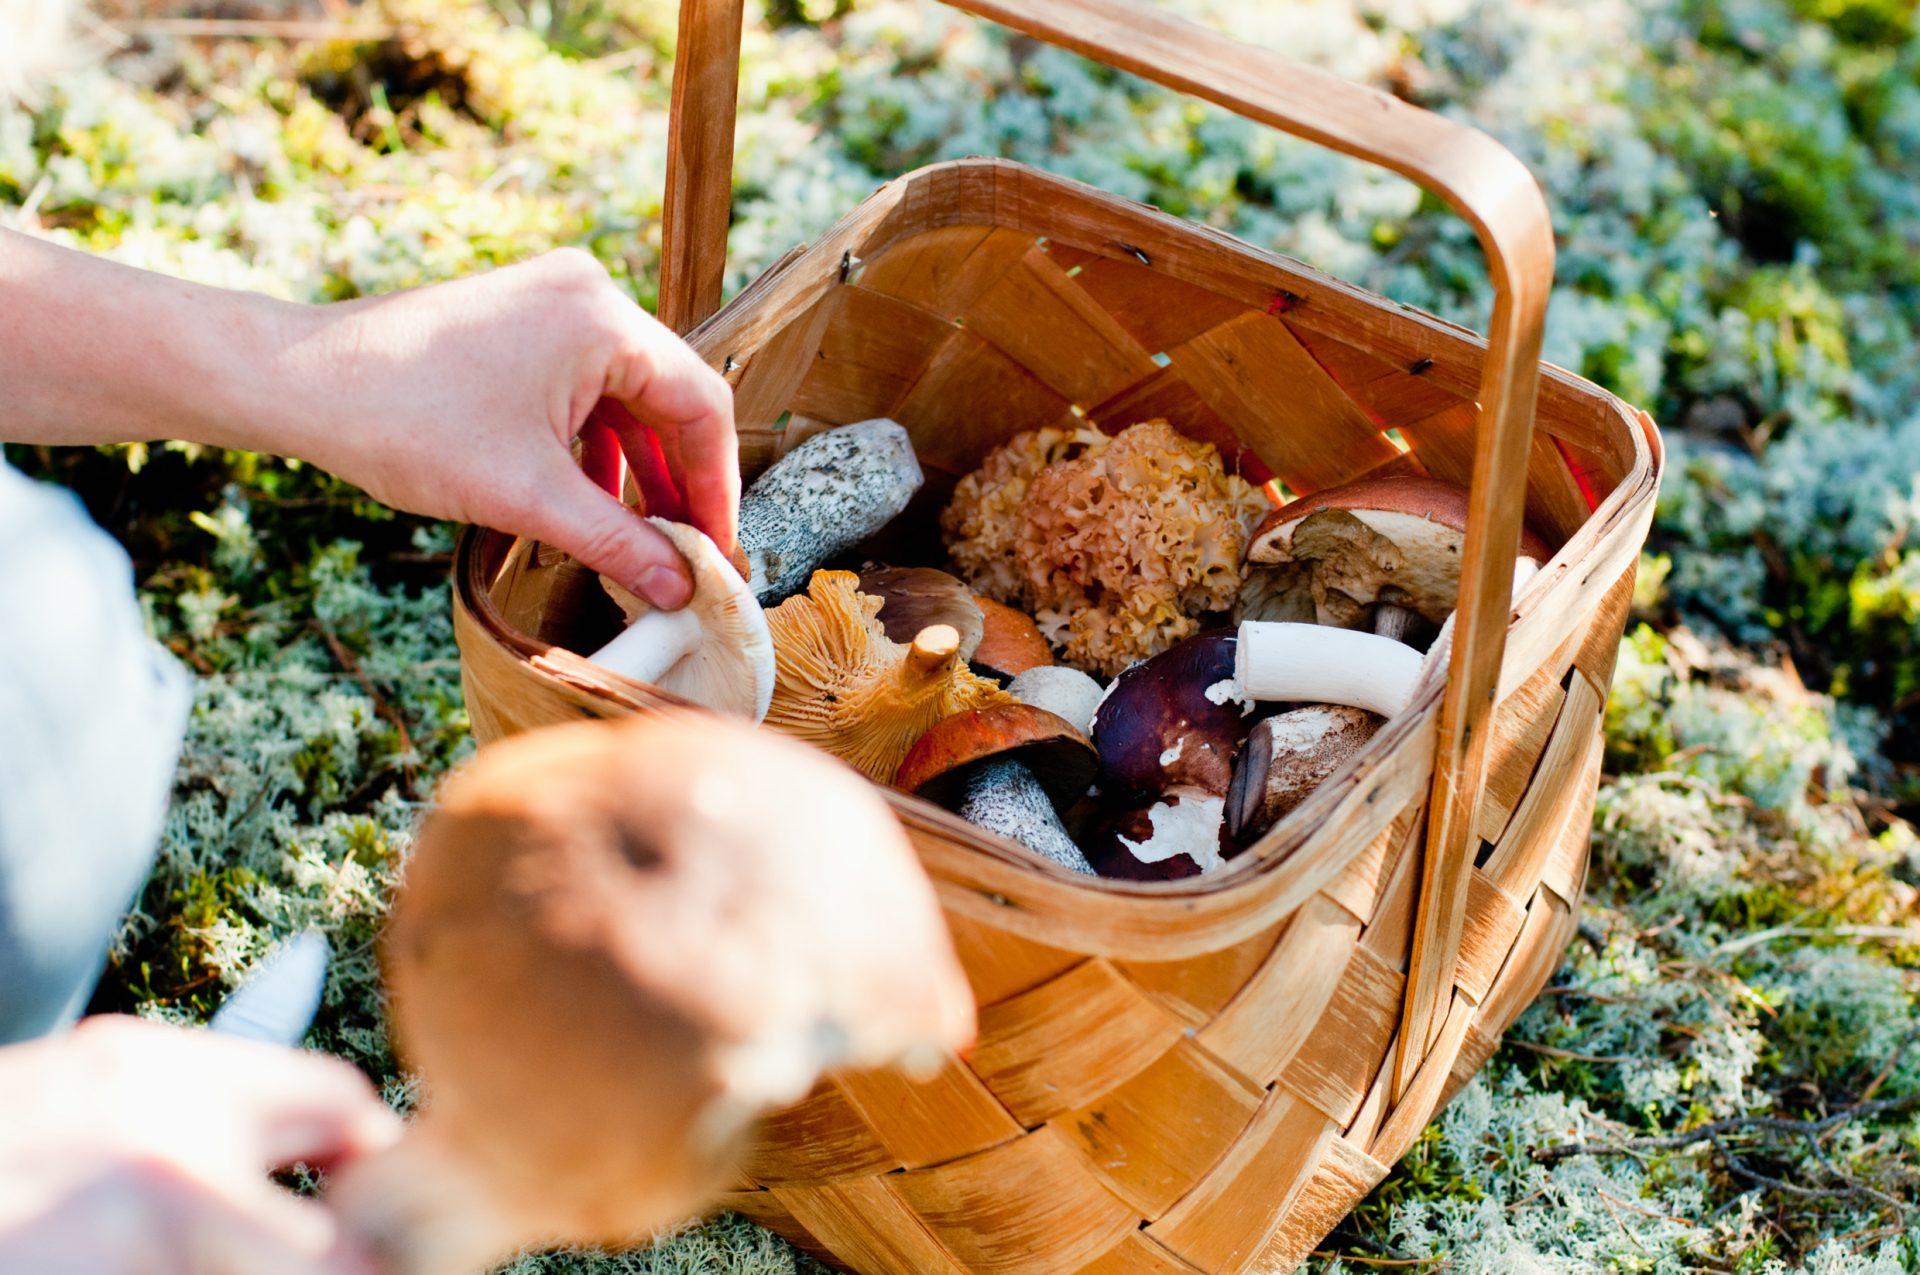 helena_wahlman-picking_mushrooms-3095